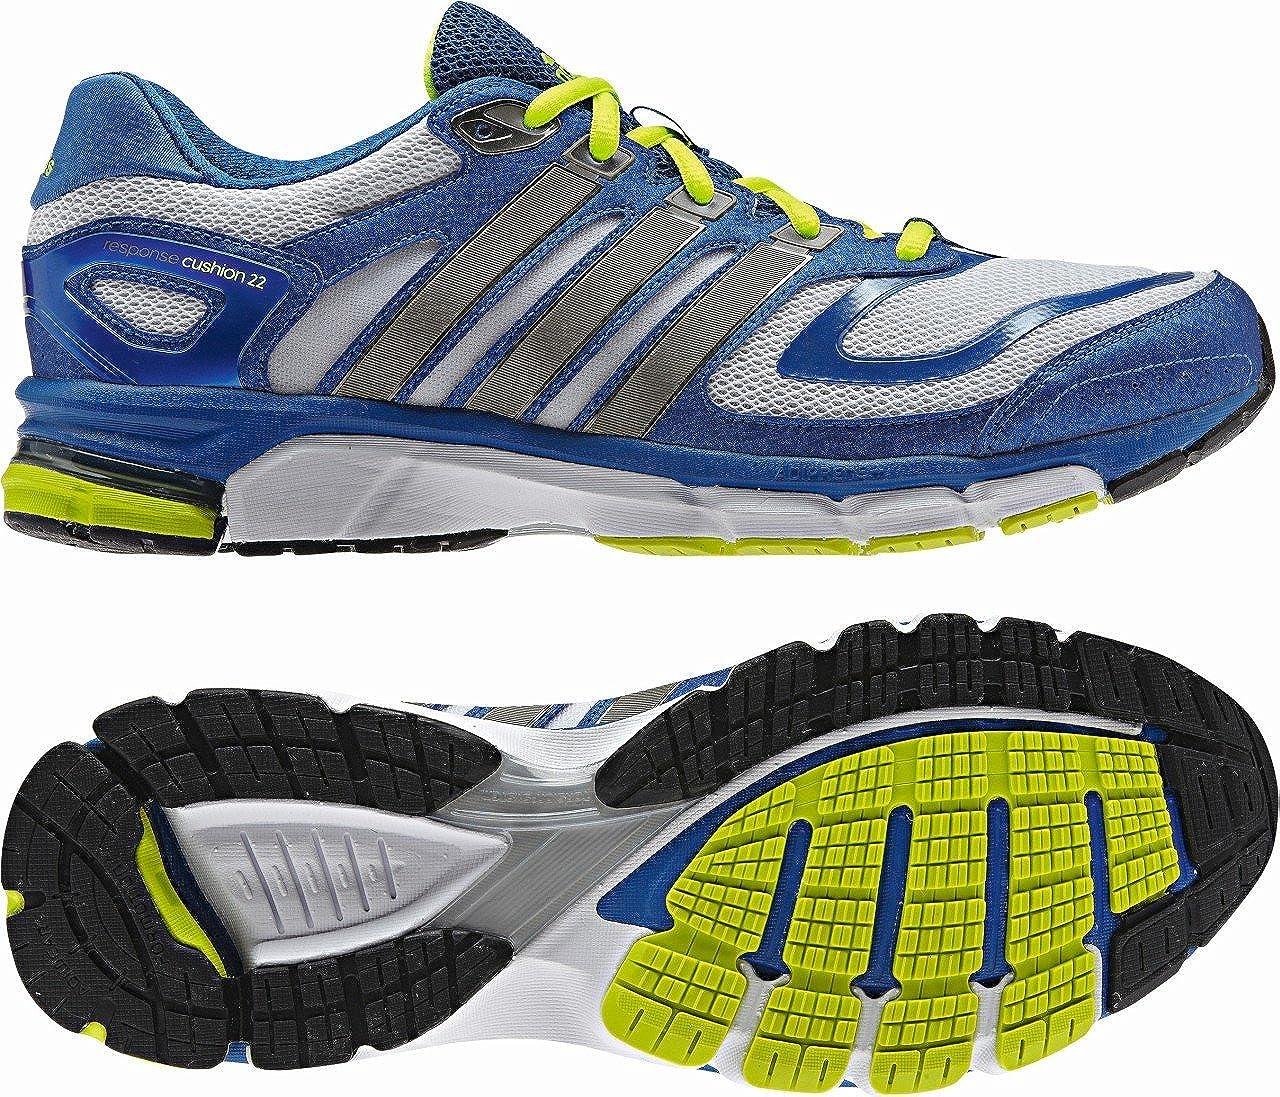 481ae3b1467dba Adidas Response Cushion 22 Running Shoes - 10  Amazon.co.uk  Shoes   Bags